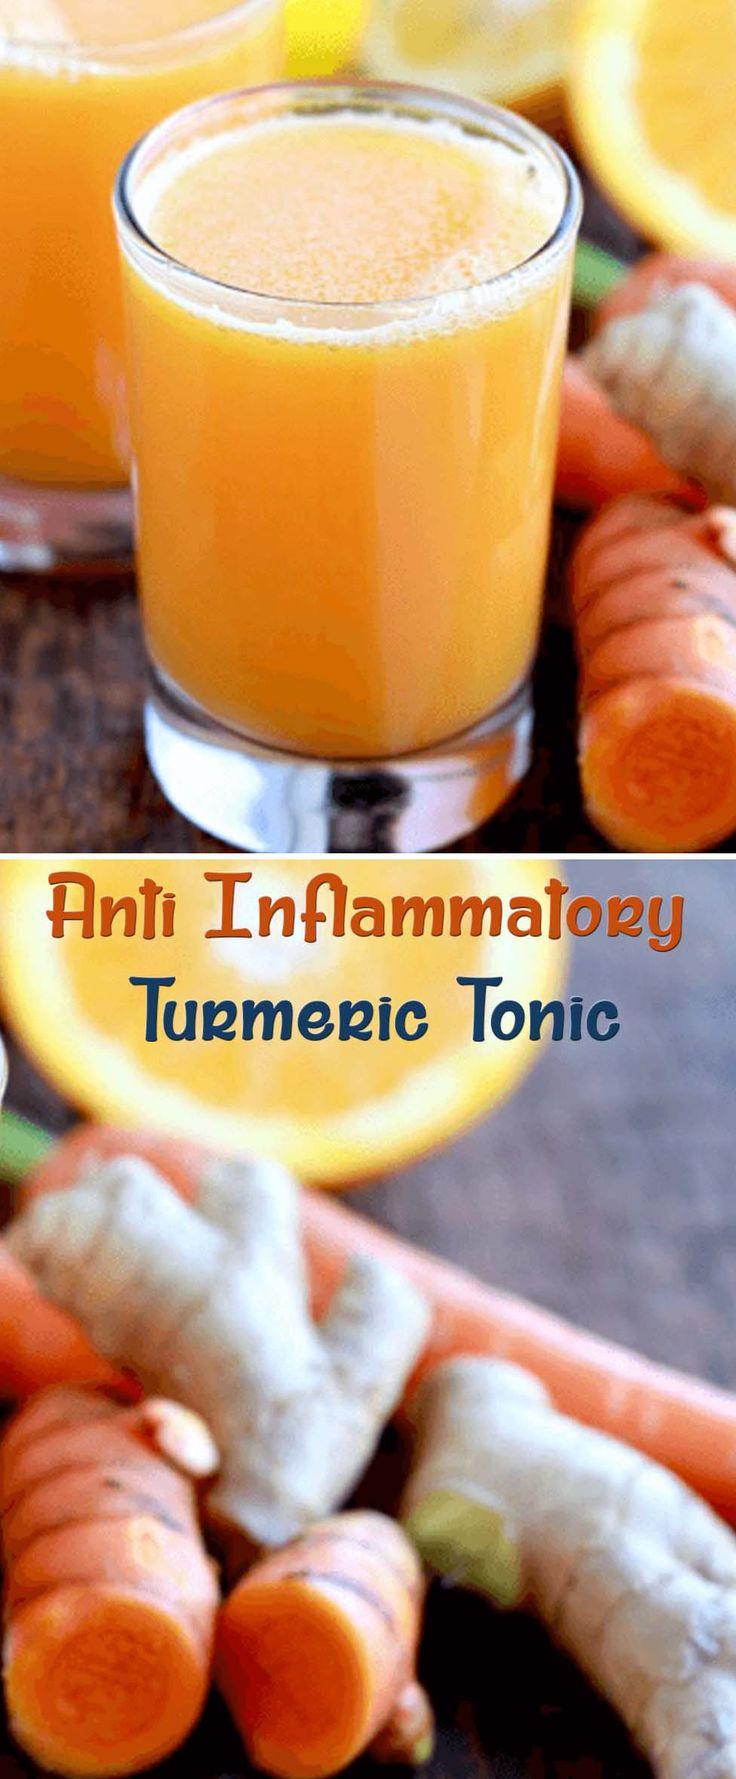 Anti Inflammatory Turmeric Tonic